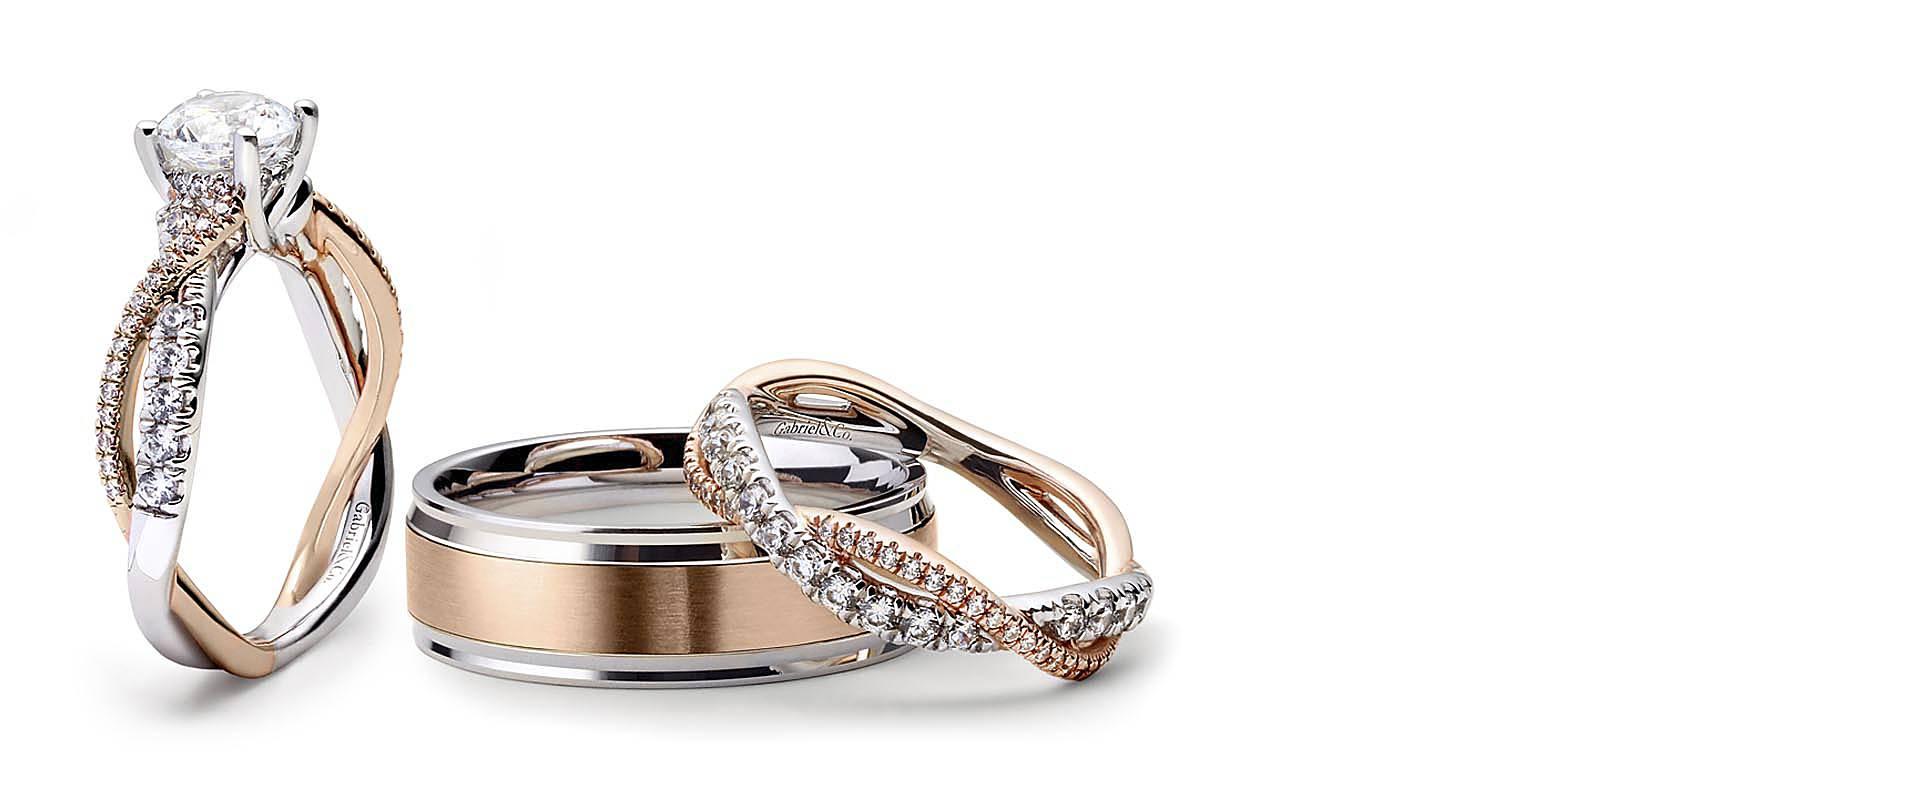 Engagement Rings & Fine Jewelry | Diamond Wedding Rings Pertaining To 2019 Diamond Layered Anniversary Ring In White Gold (View 11 of 25)